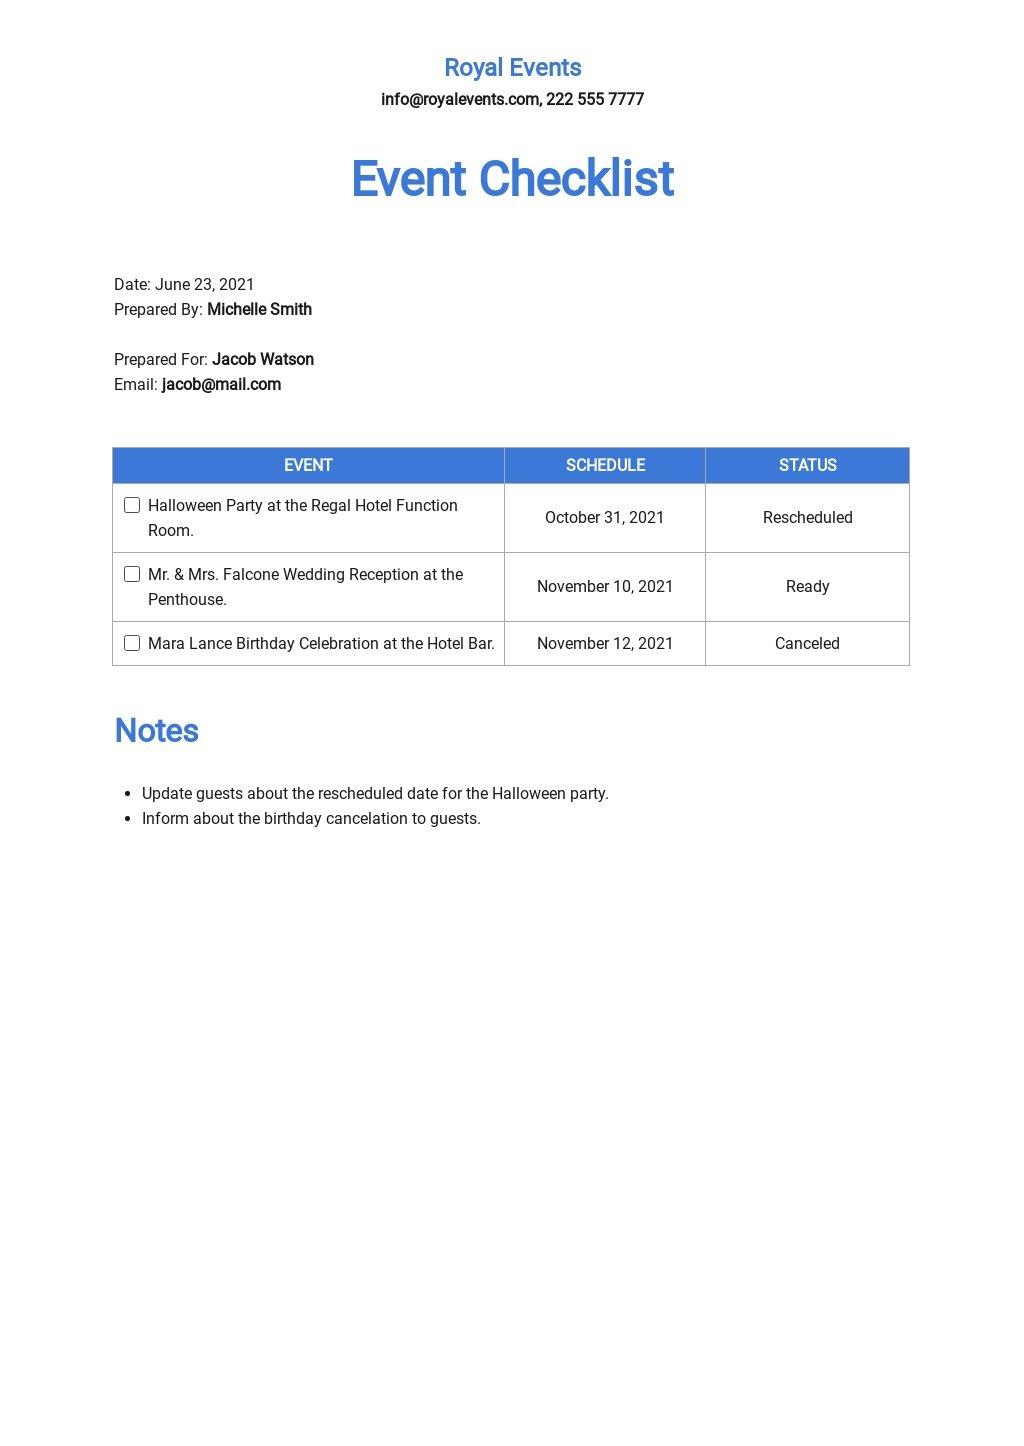 Event Checklist Template.jpe